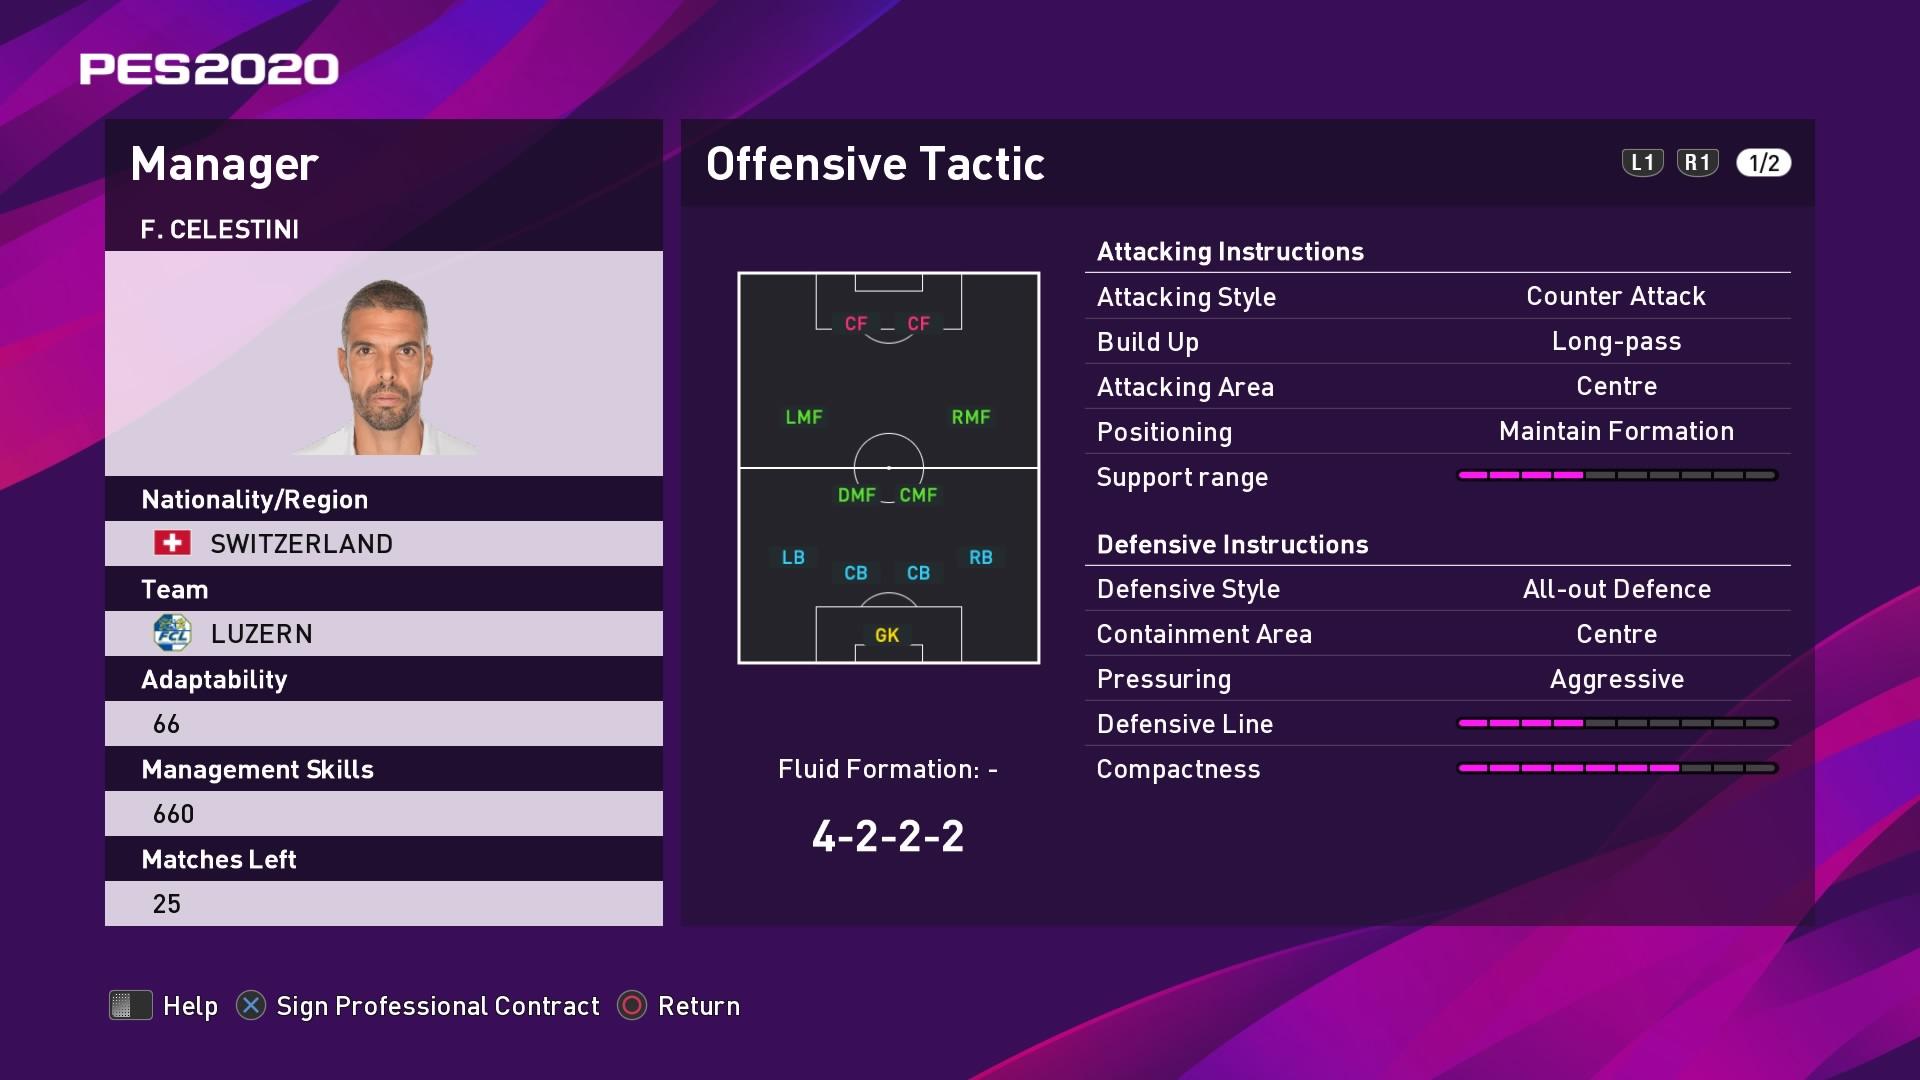 F. Celestini (Fabio Celestini) Offensive Tactic in PES 2020 myClub